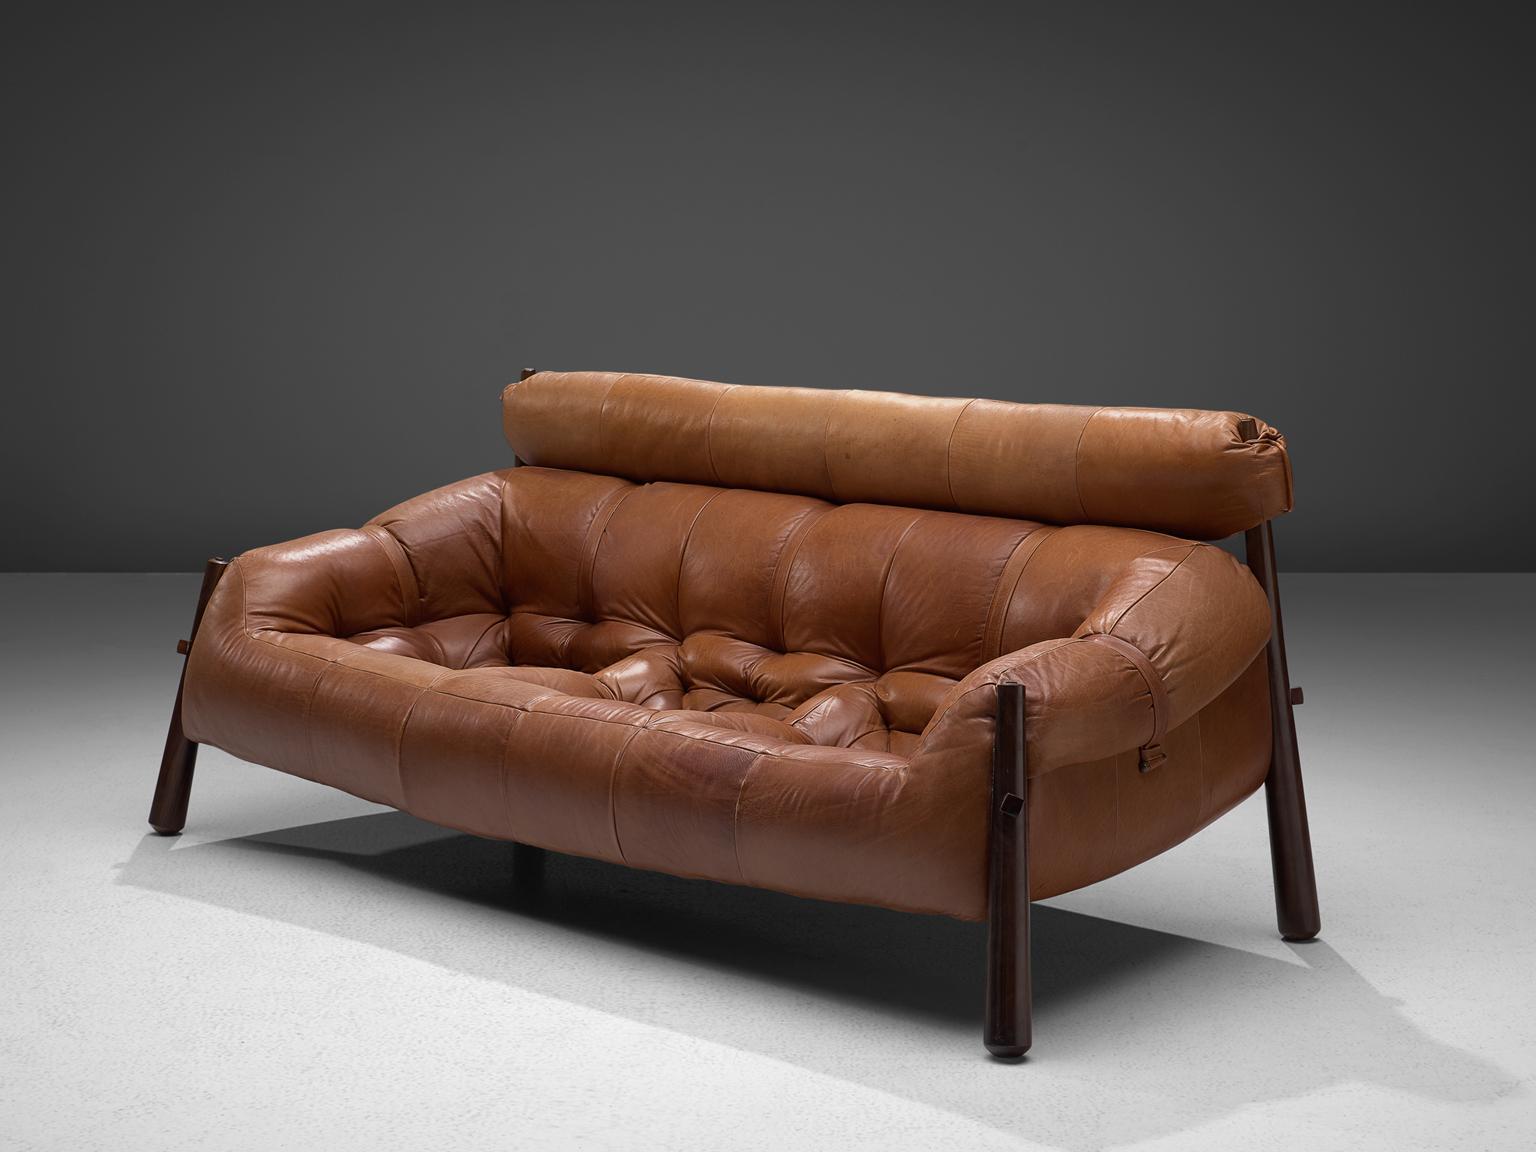 Superbe Percival Lafer U0027Mp 81u0027 Lounge Set In Rosewood And Cognac